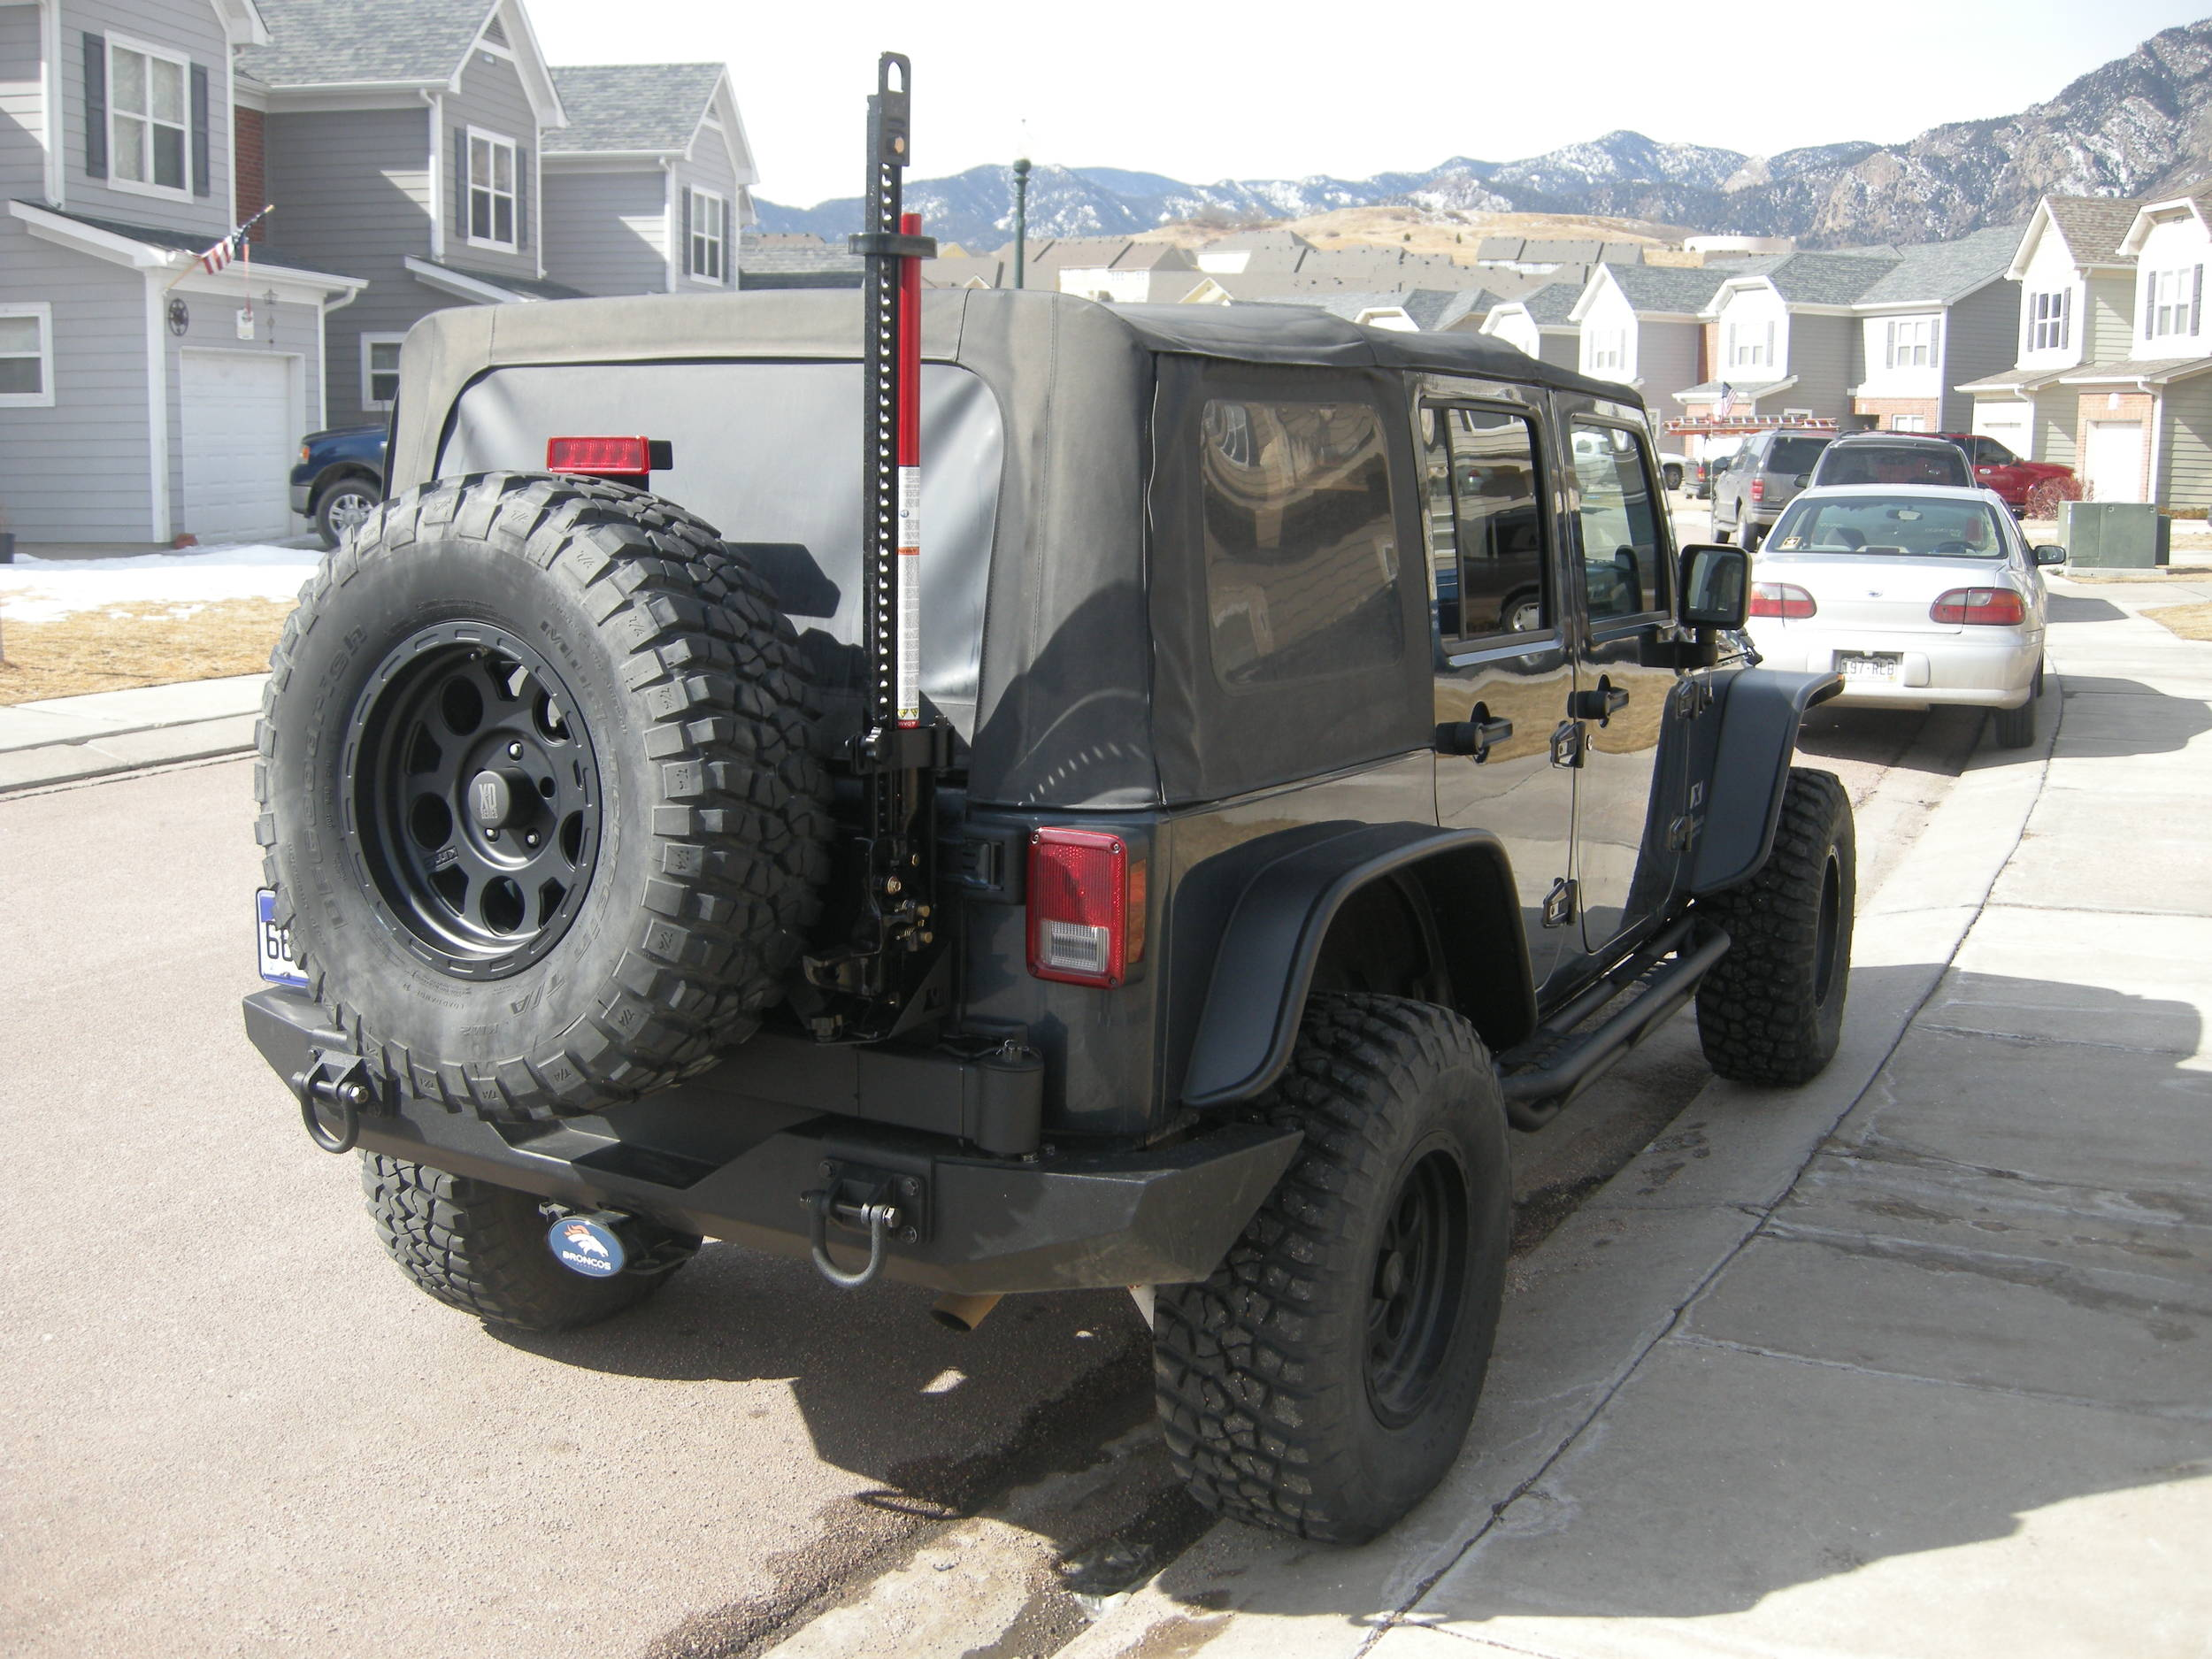 Jeep_00136.JPG